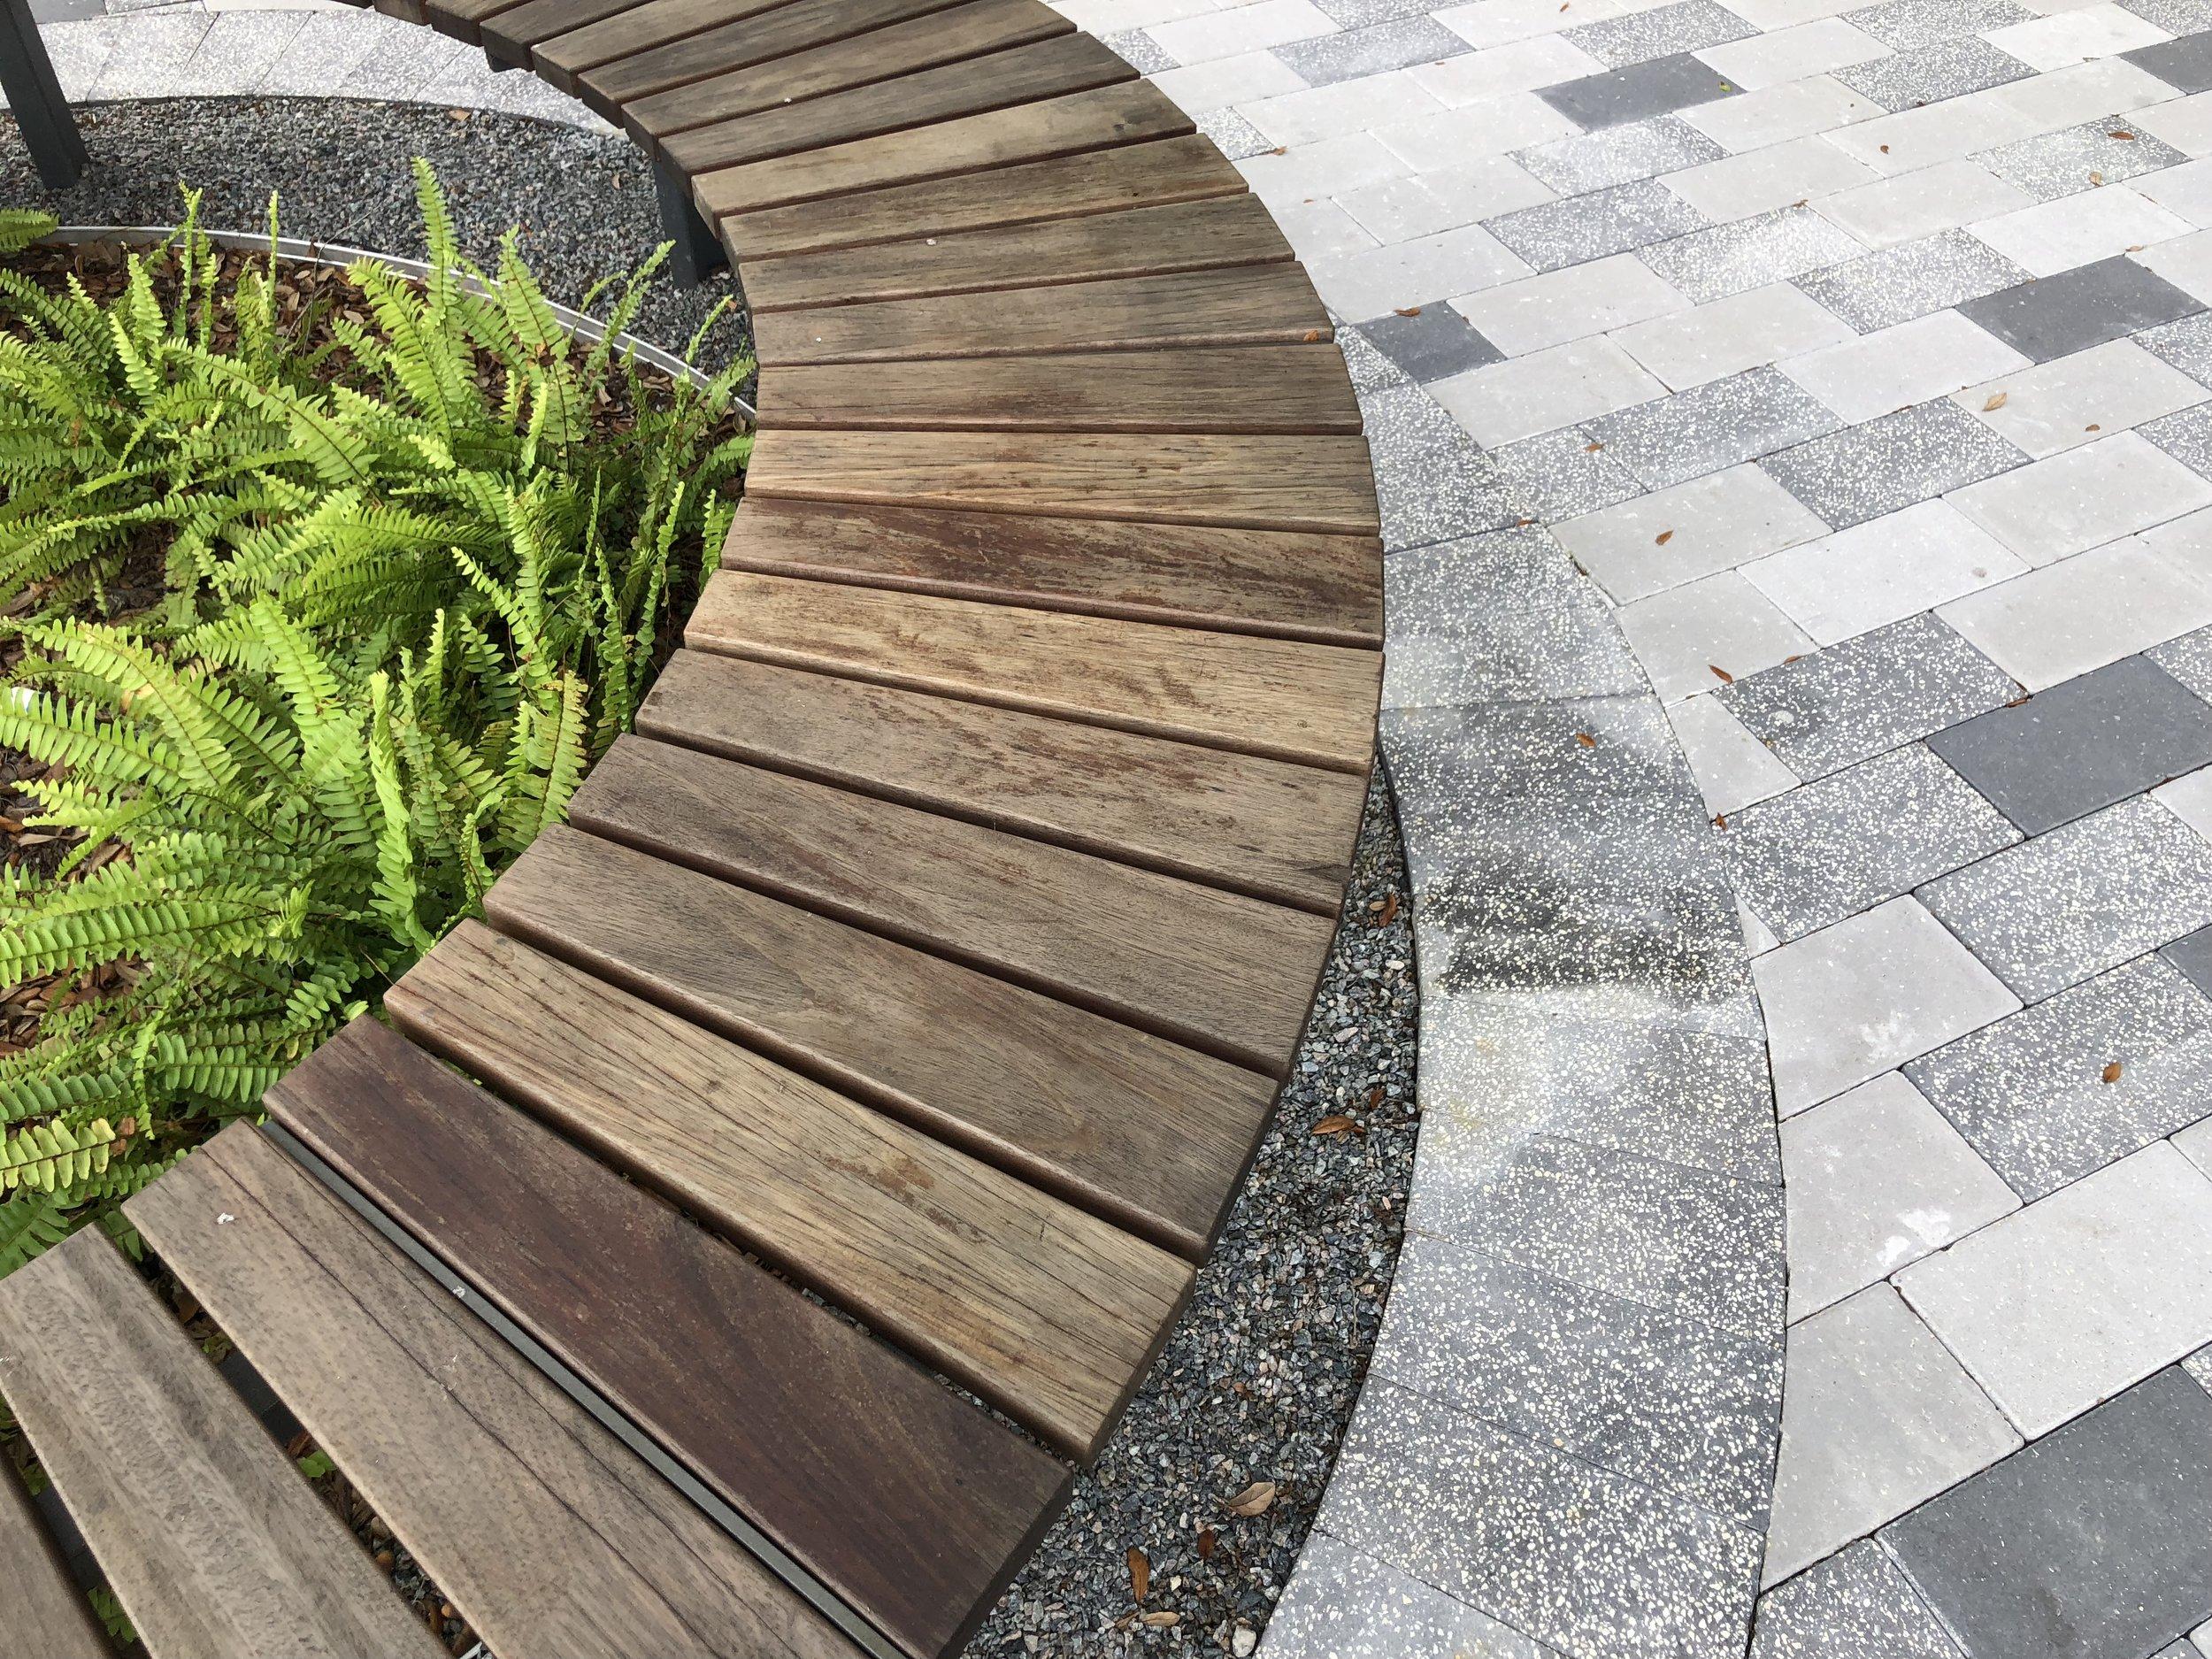 Novel Lucerne courtyard 3.jpg